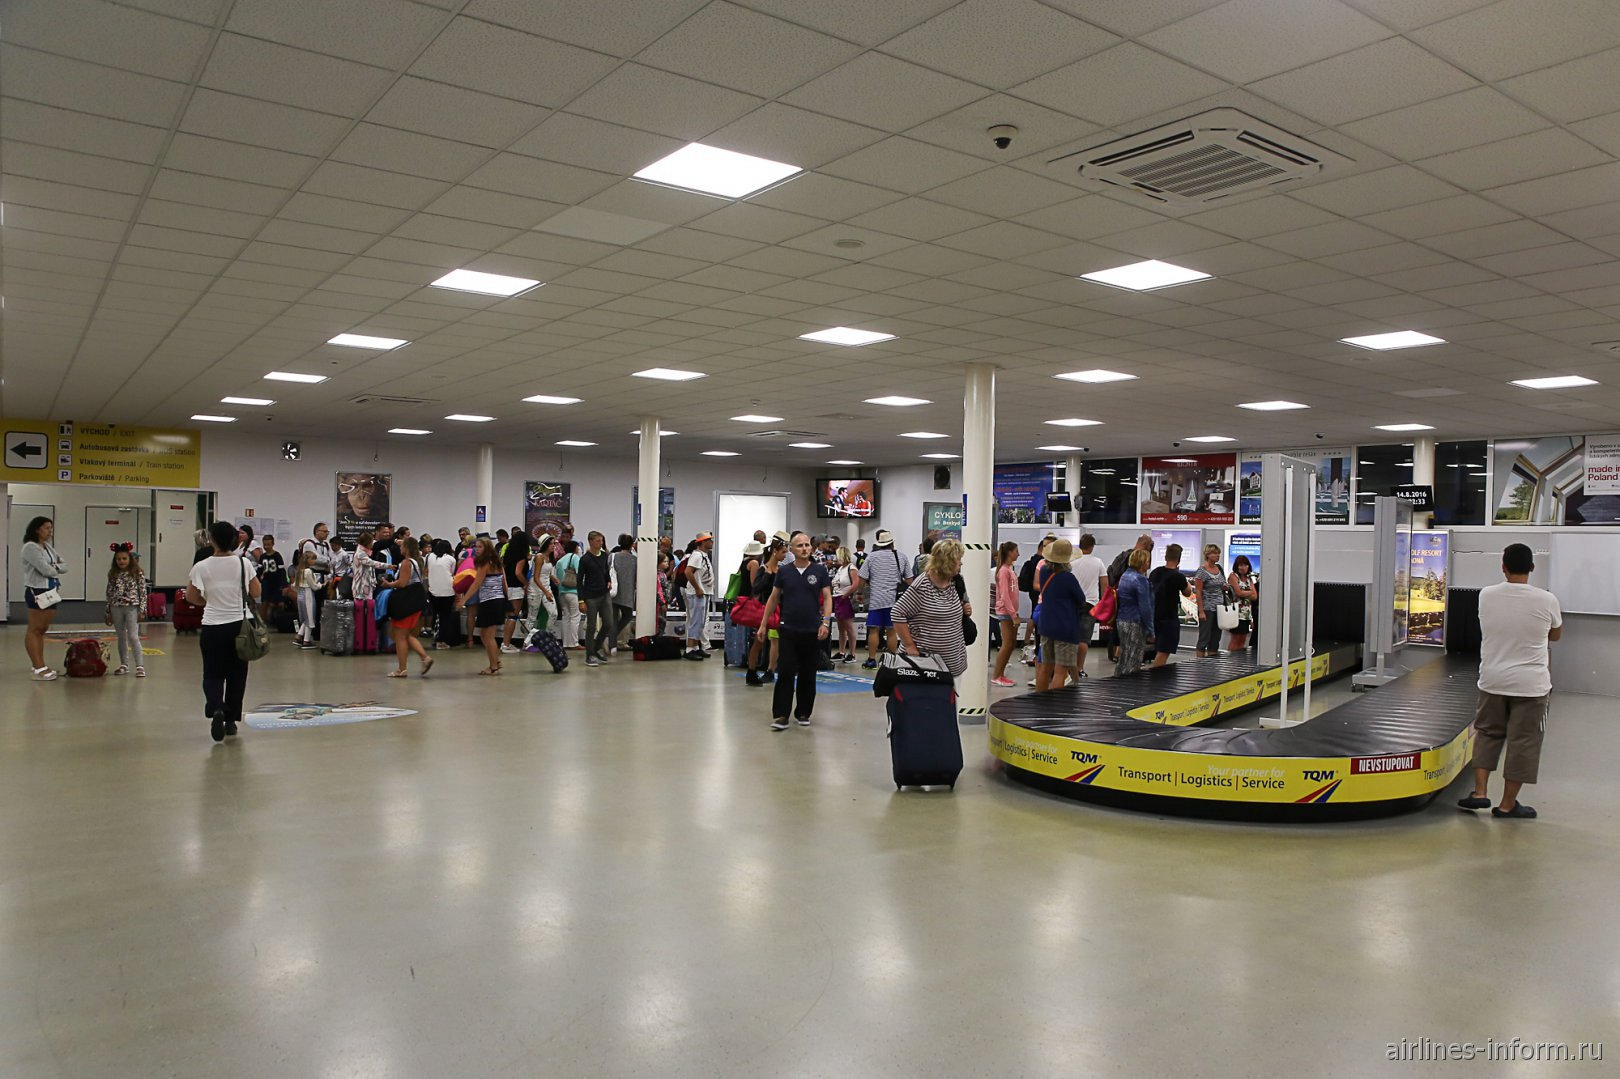 Зал выдачи багажа в аэропорту Острава Леош Яначек